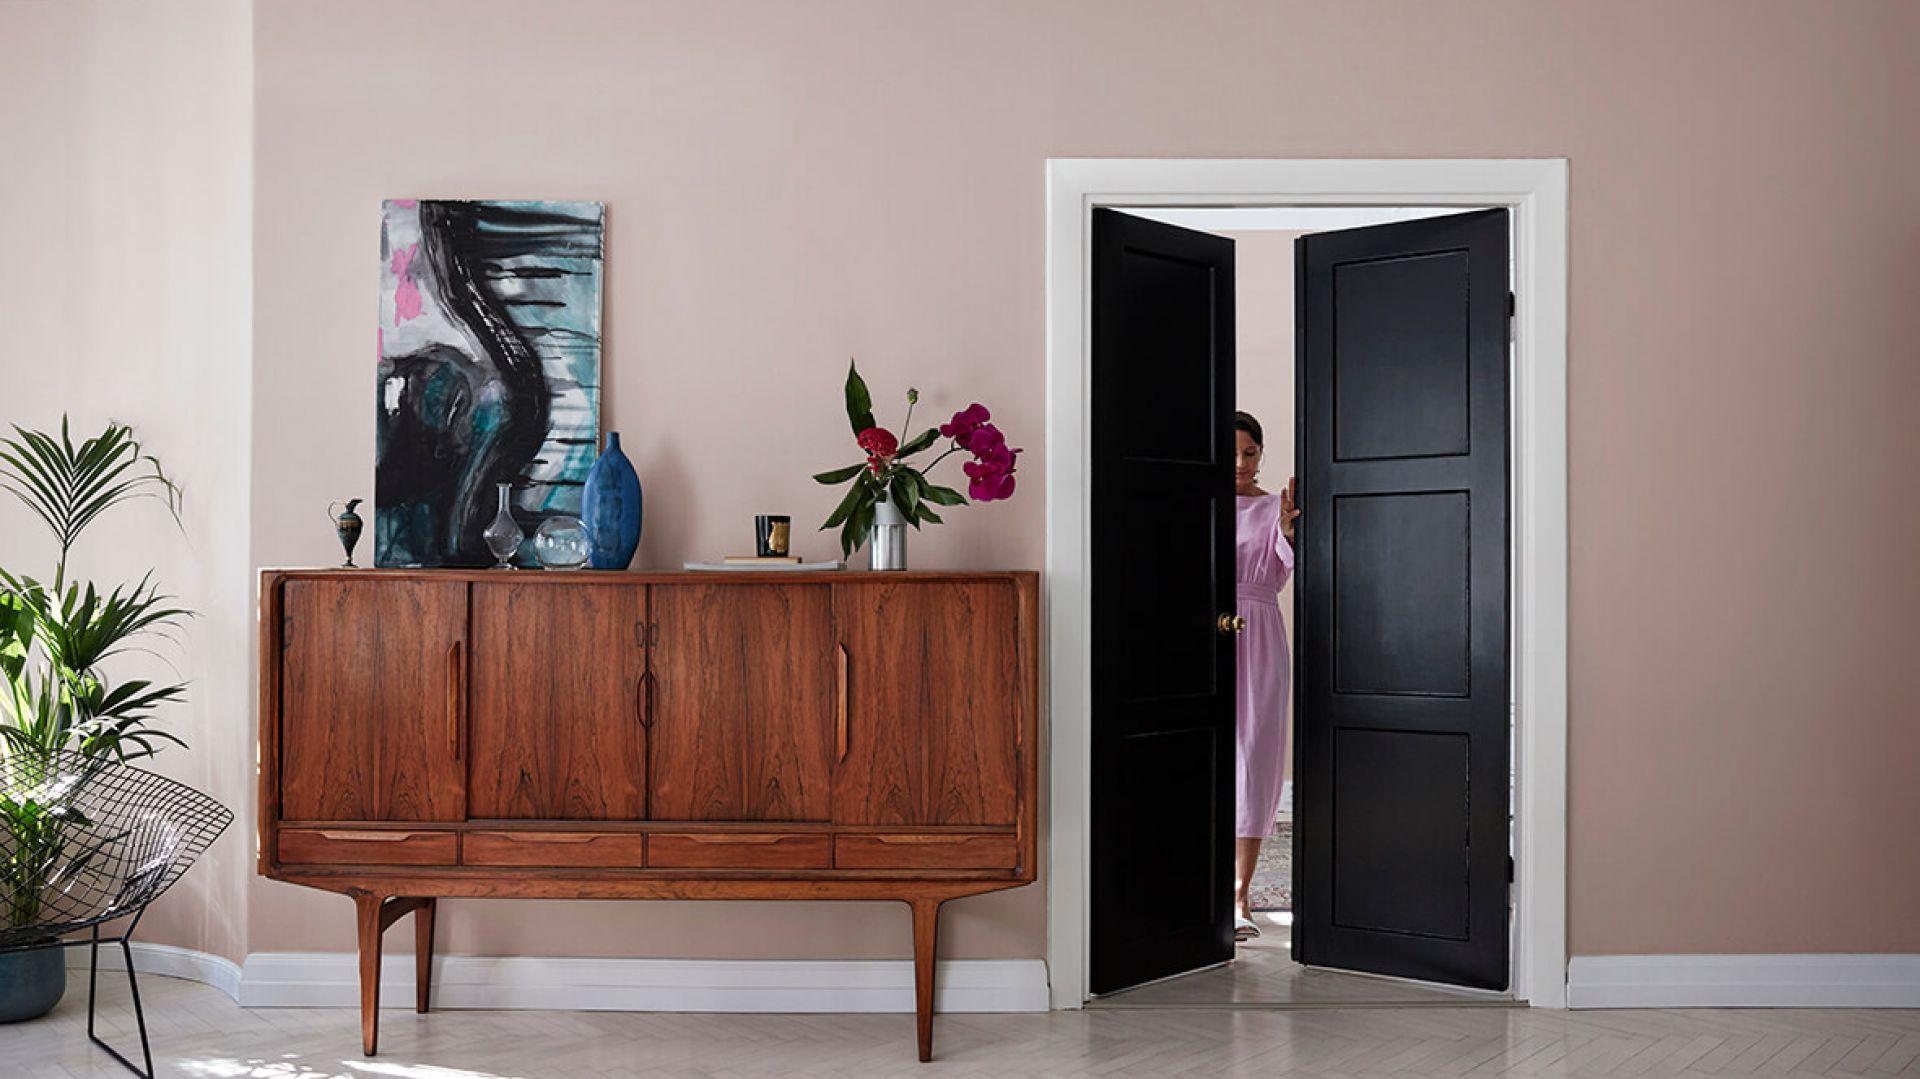 Kolory z palety farb Tikkurila Feel the Color - styl Luxurious. Fot. Tikkurila